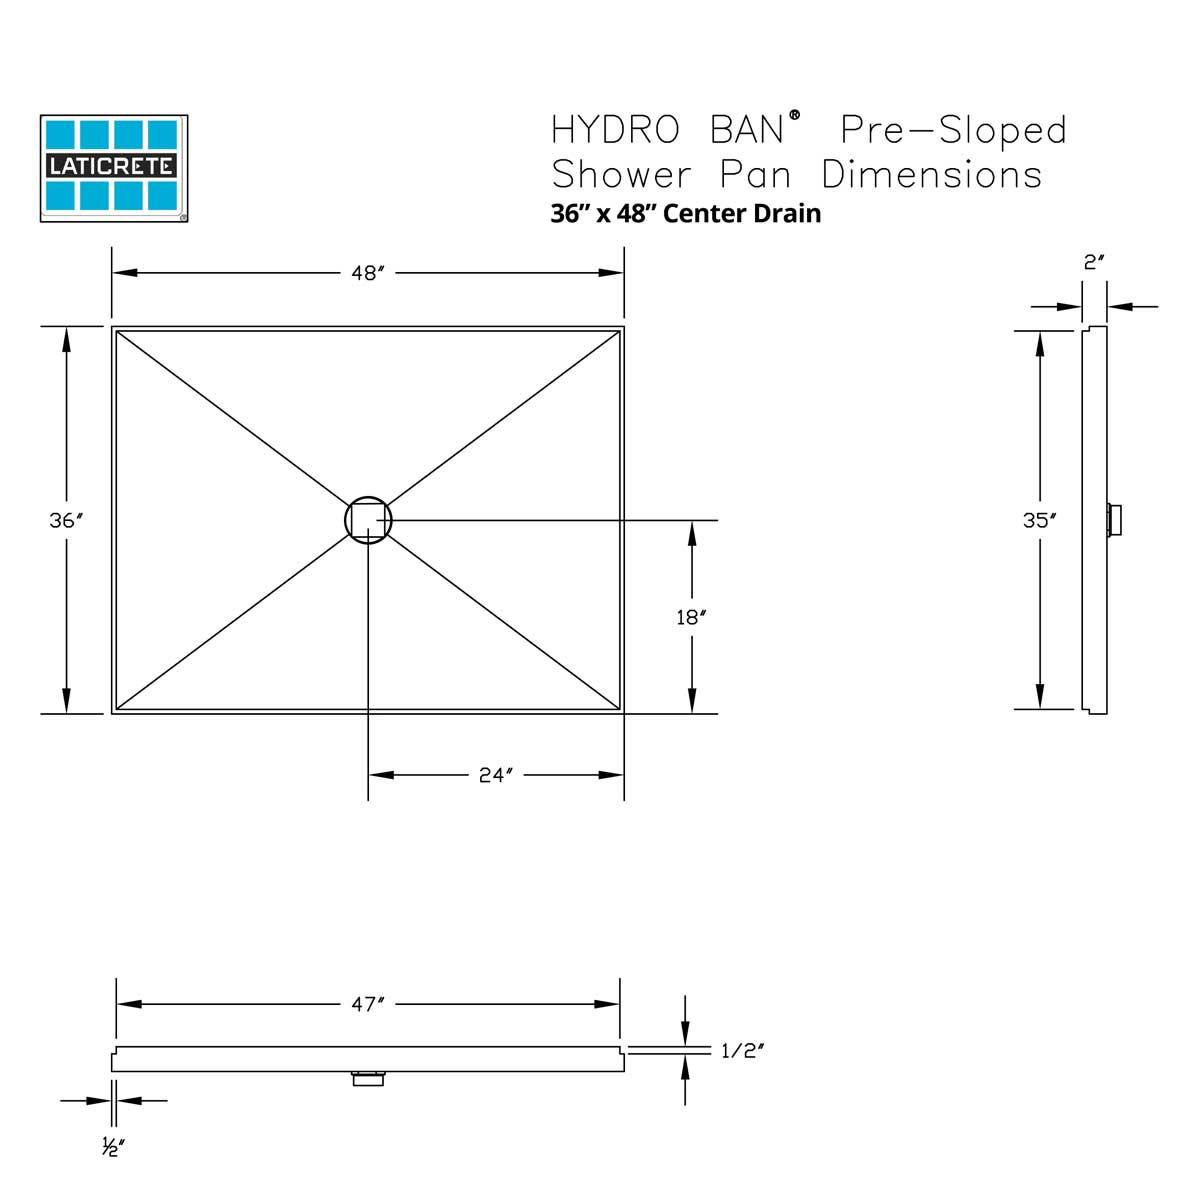 9352-3648-PVC Center Drain 36 x 48in Hydro Ban Pre-sloped Shower Pan